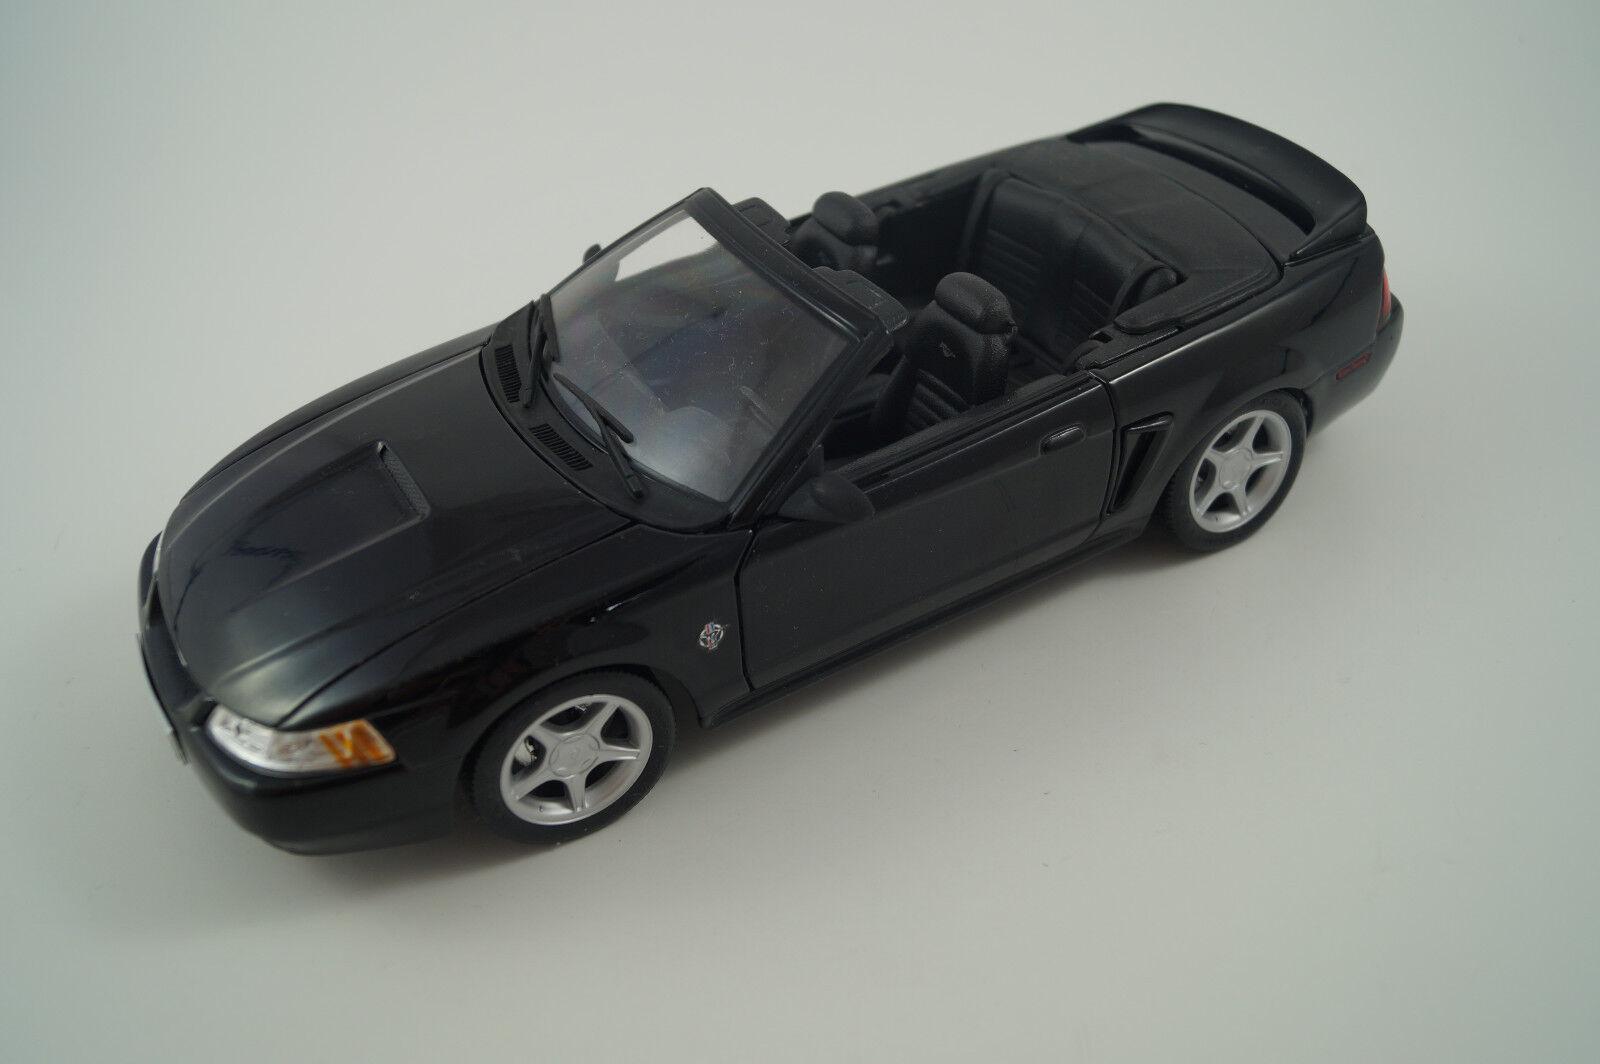 Maisto Voiture Miniature 1 18 mustang GT 1999